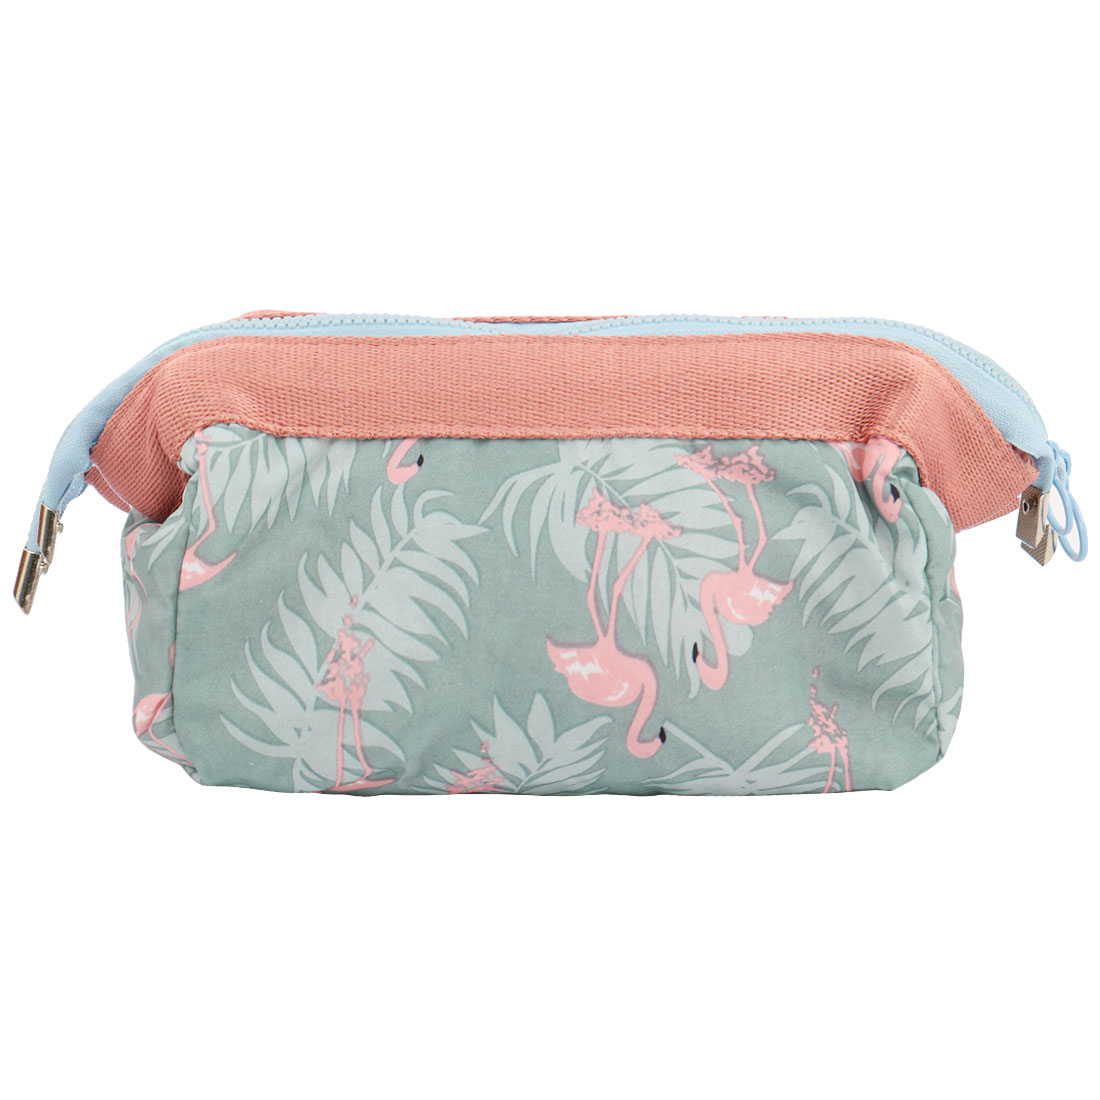 Travel Cosmetic Makeup Bag Wash Bag Pouch Toiletry Purse Beauty Case Light Blue